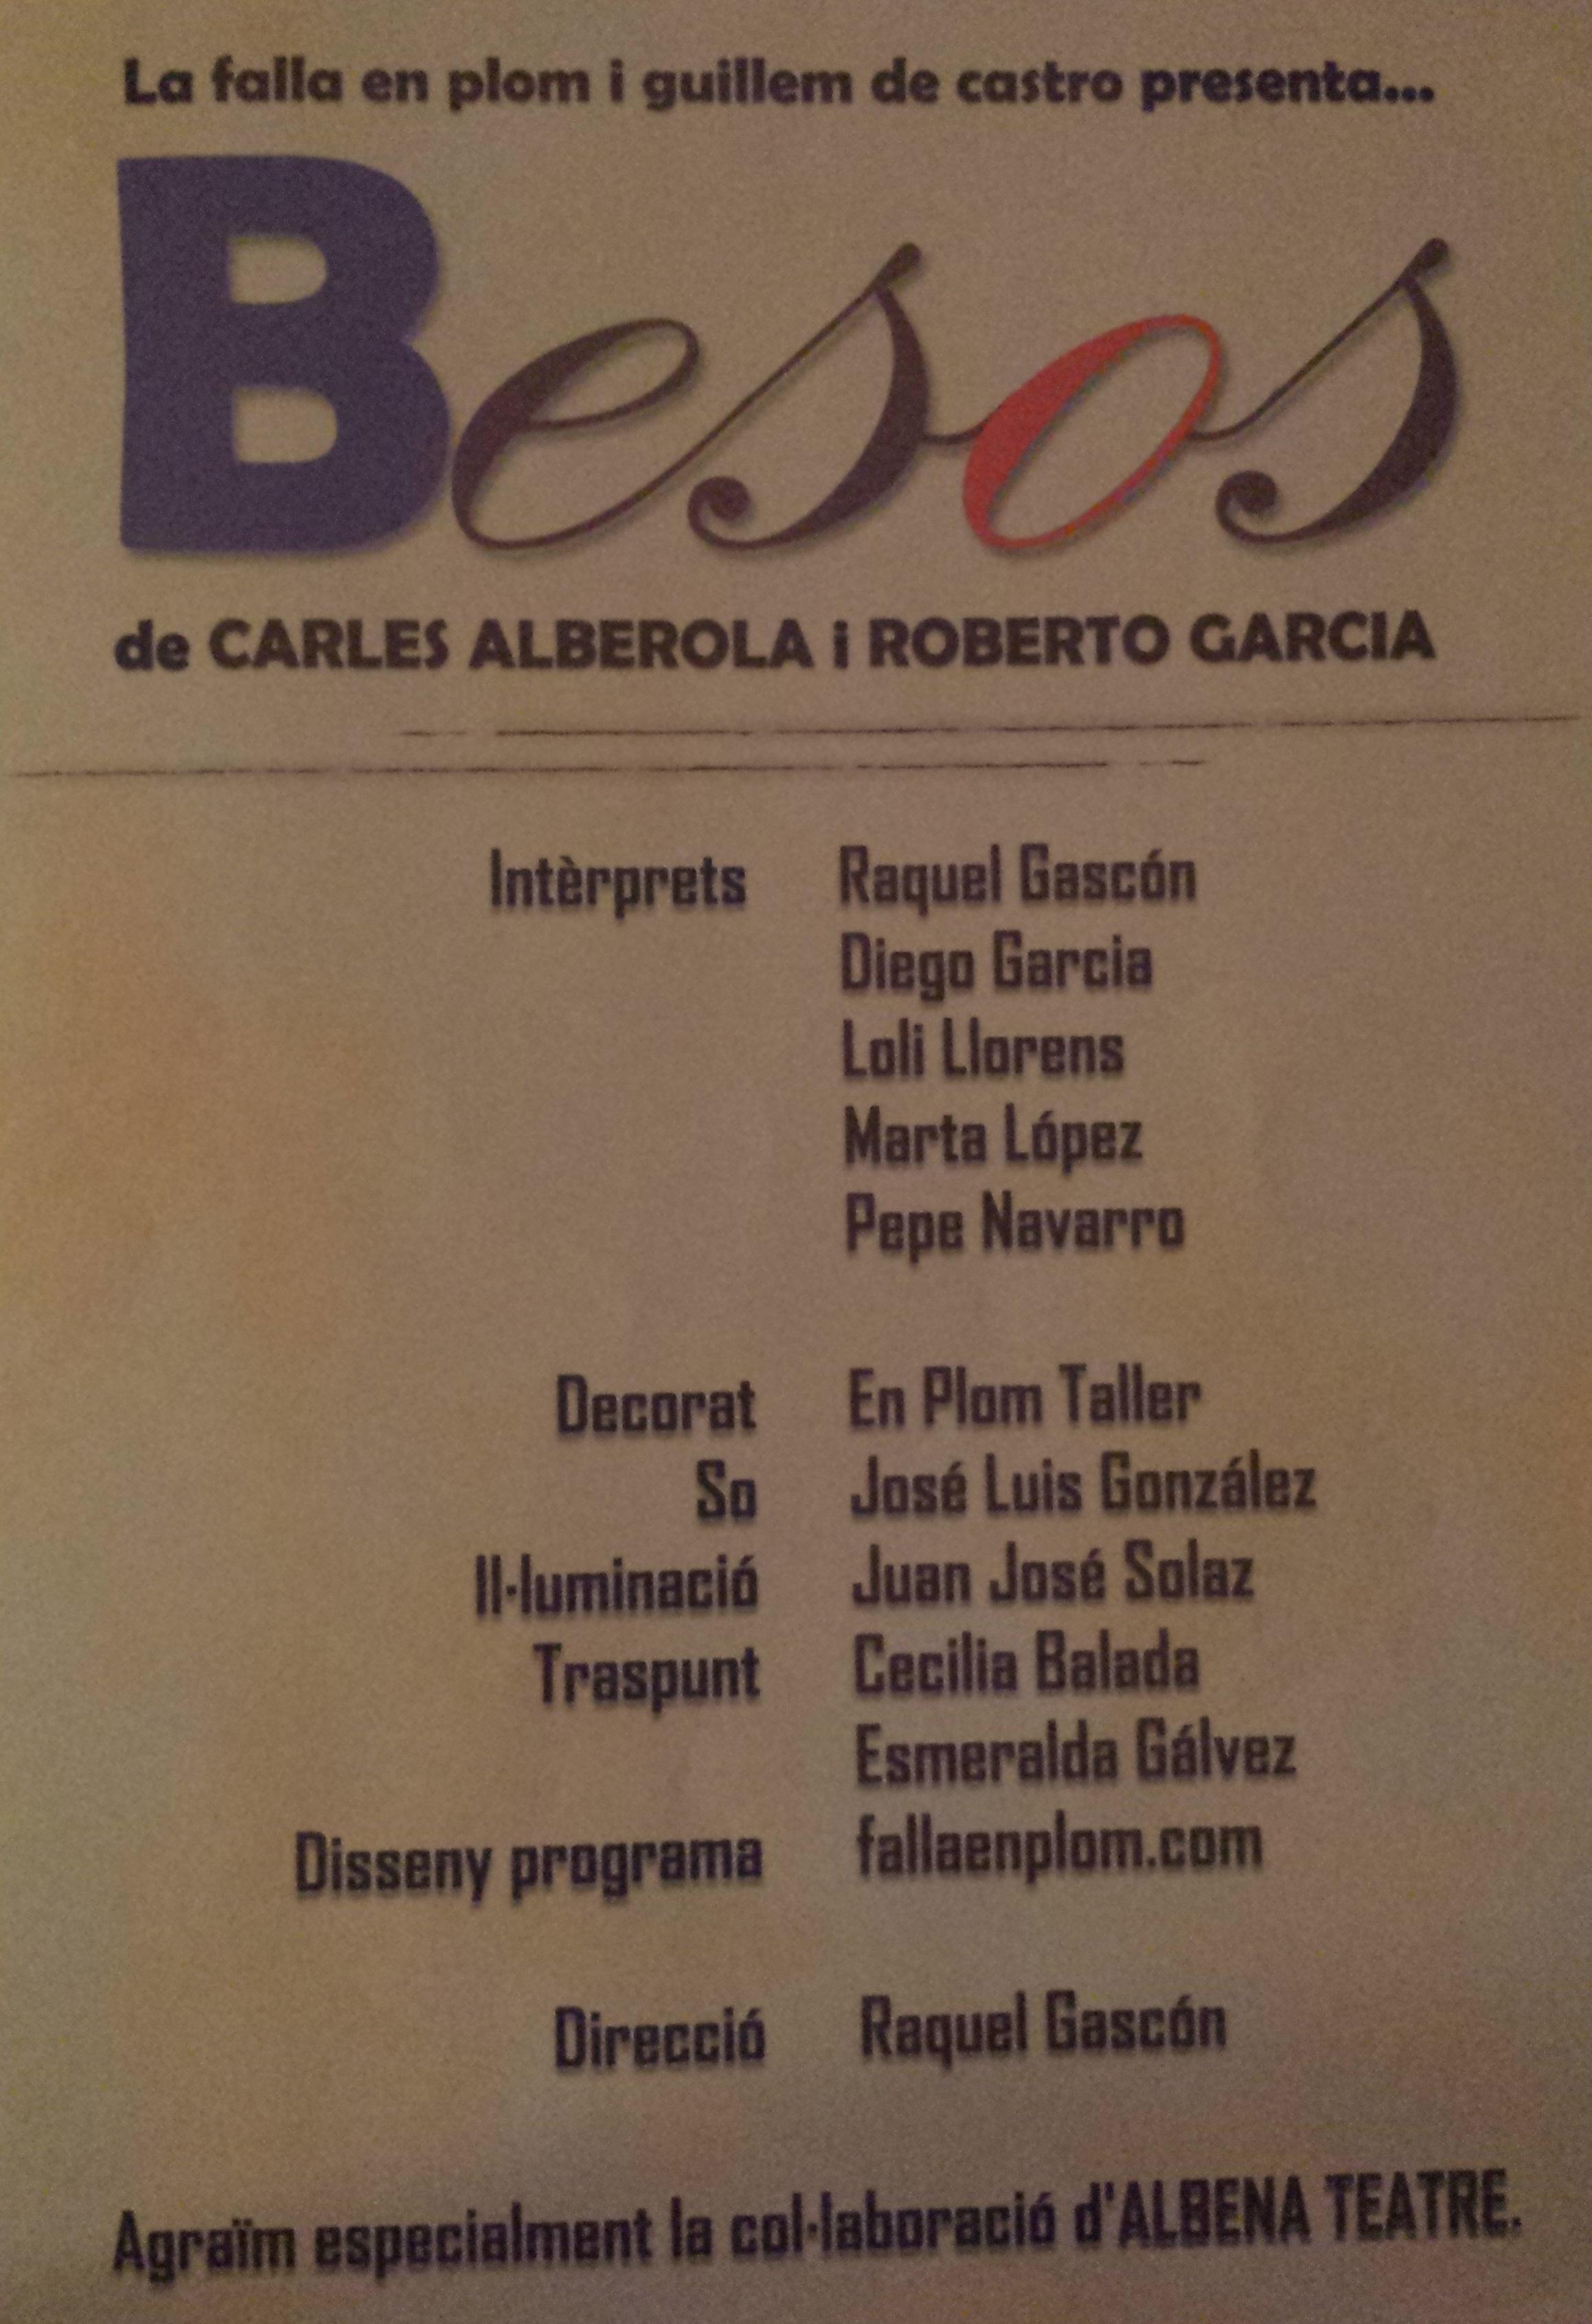 Besos 2005 _Teatro programa